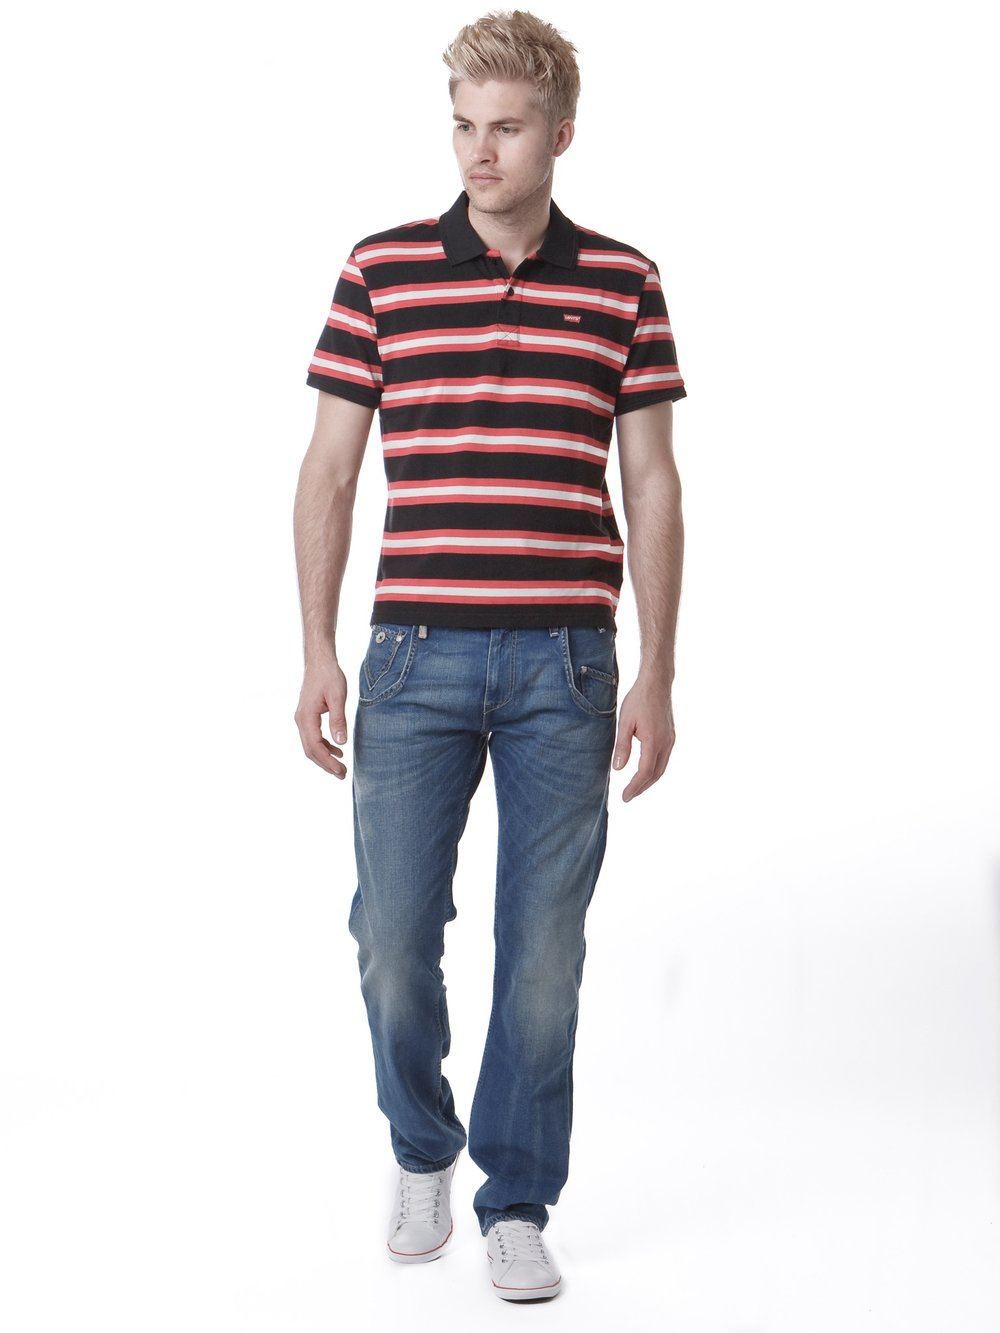 Ecomm Jeans Denim Photography Photoshoot